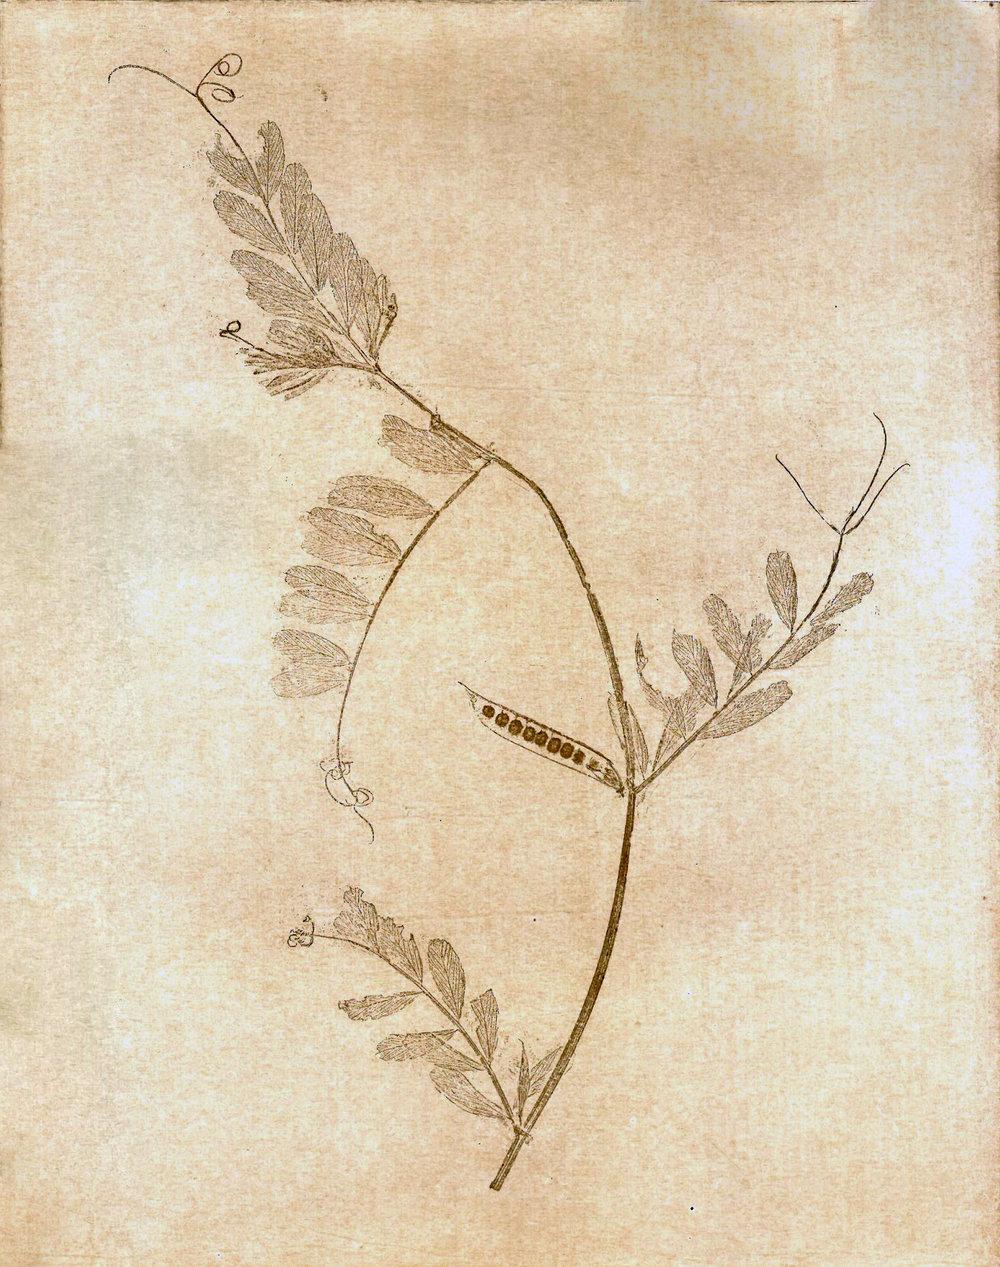 - Vicia sativa subsp. segetalisCommon vetchGarden vetchNarrowlef vetchTare